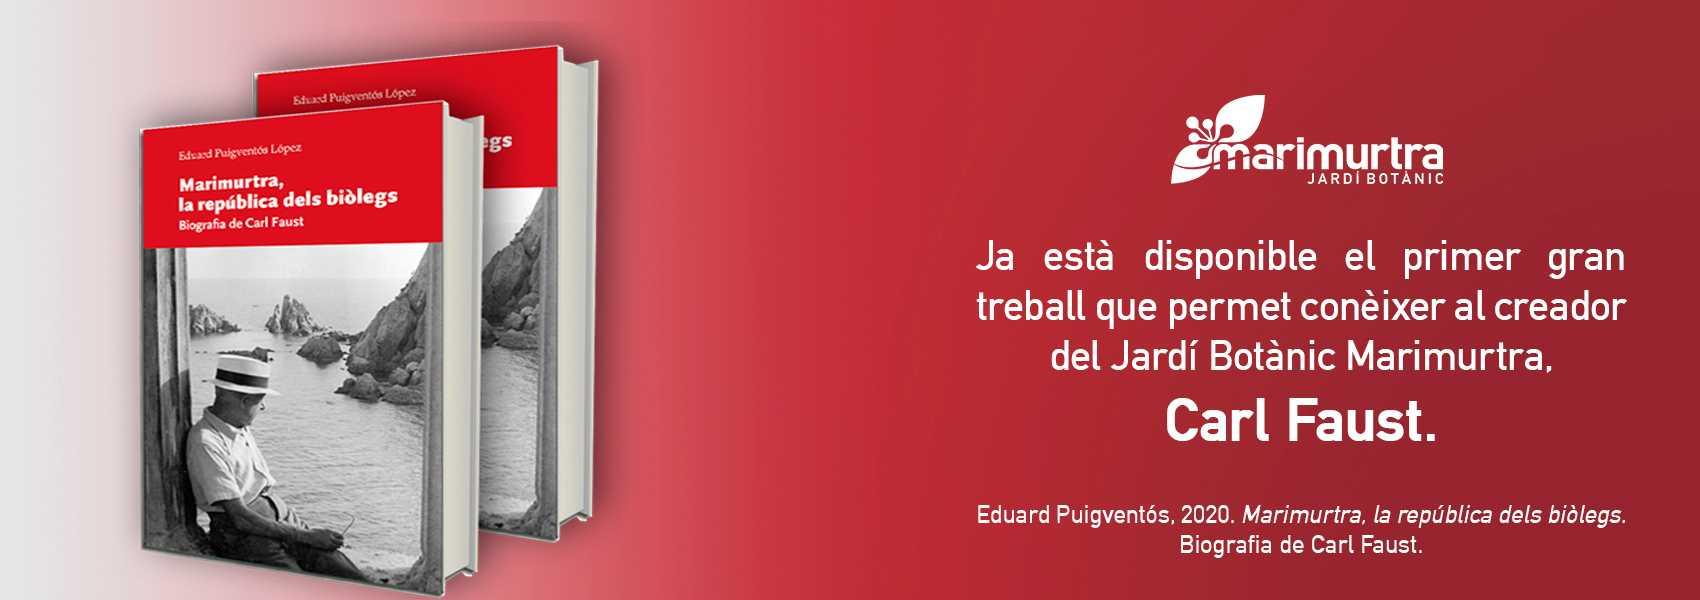 biografia-carl-faust-marimurtra